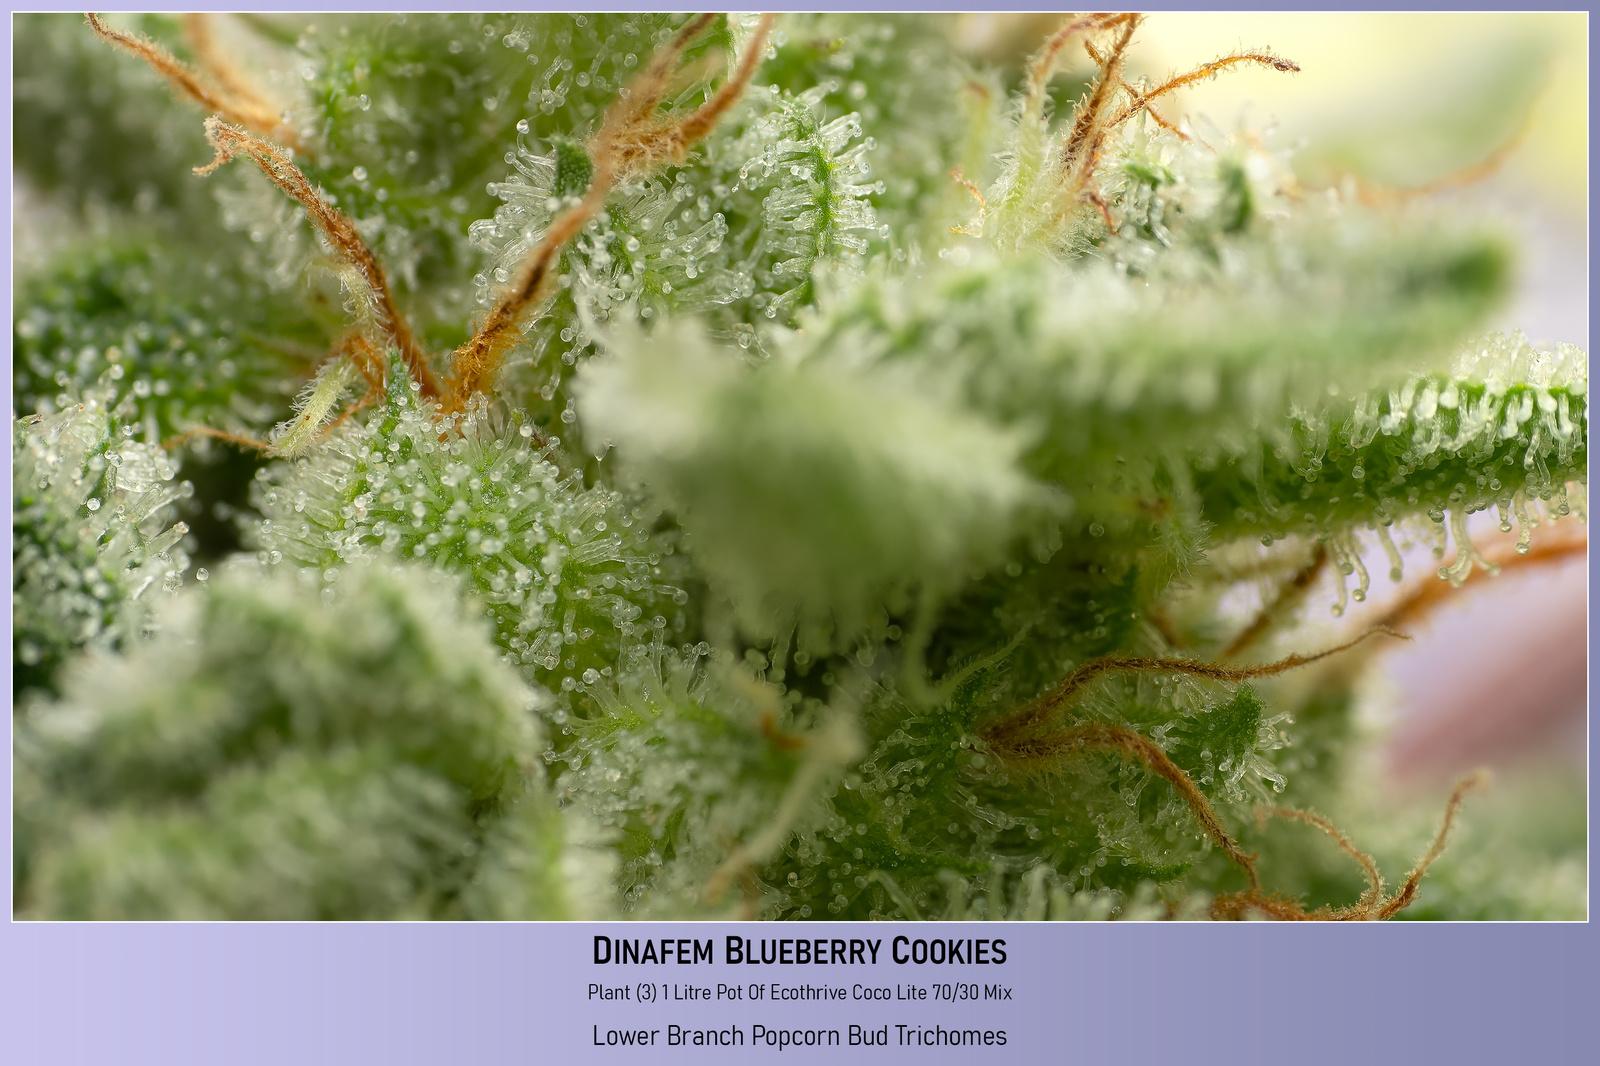 large.6034efbaa7e97_Dinafem-BlueBerryCookies-Plant3-1LitrePotOfCocoPerlite-LowerSideBudTrichomes-23-02-2021.jpg